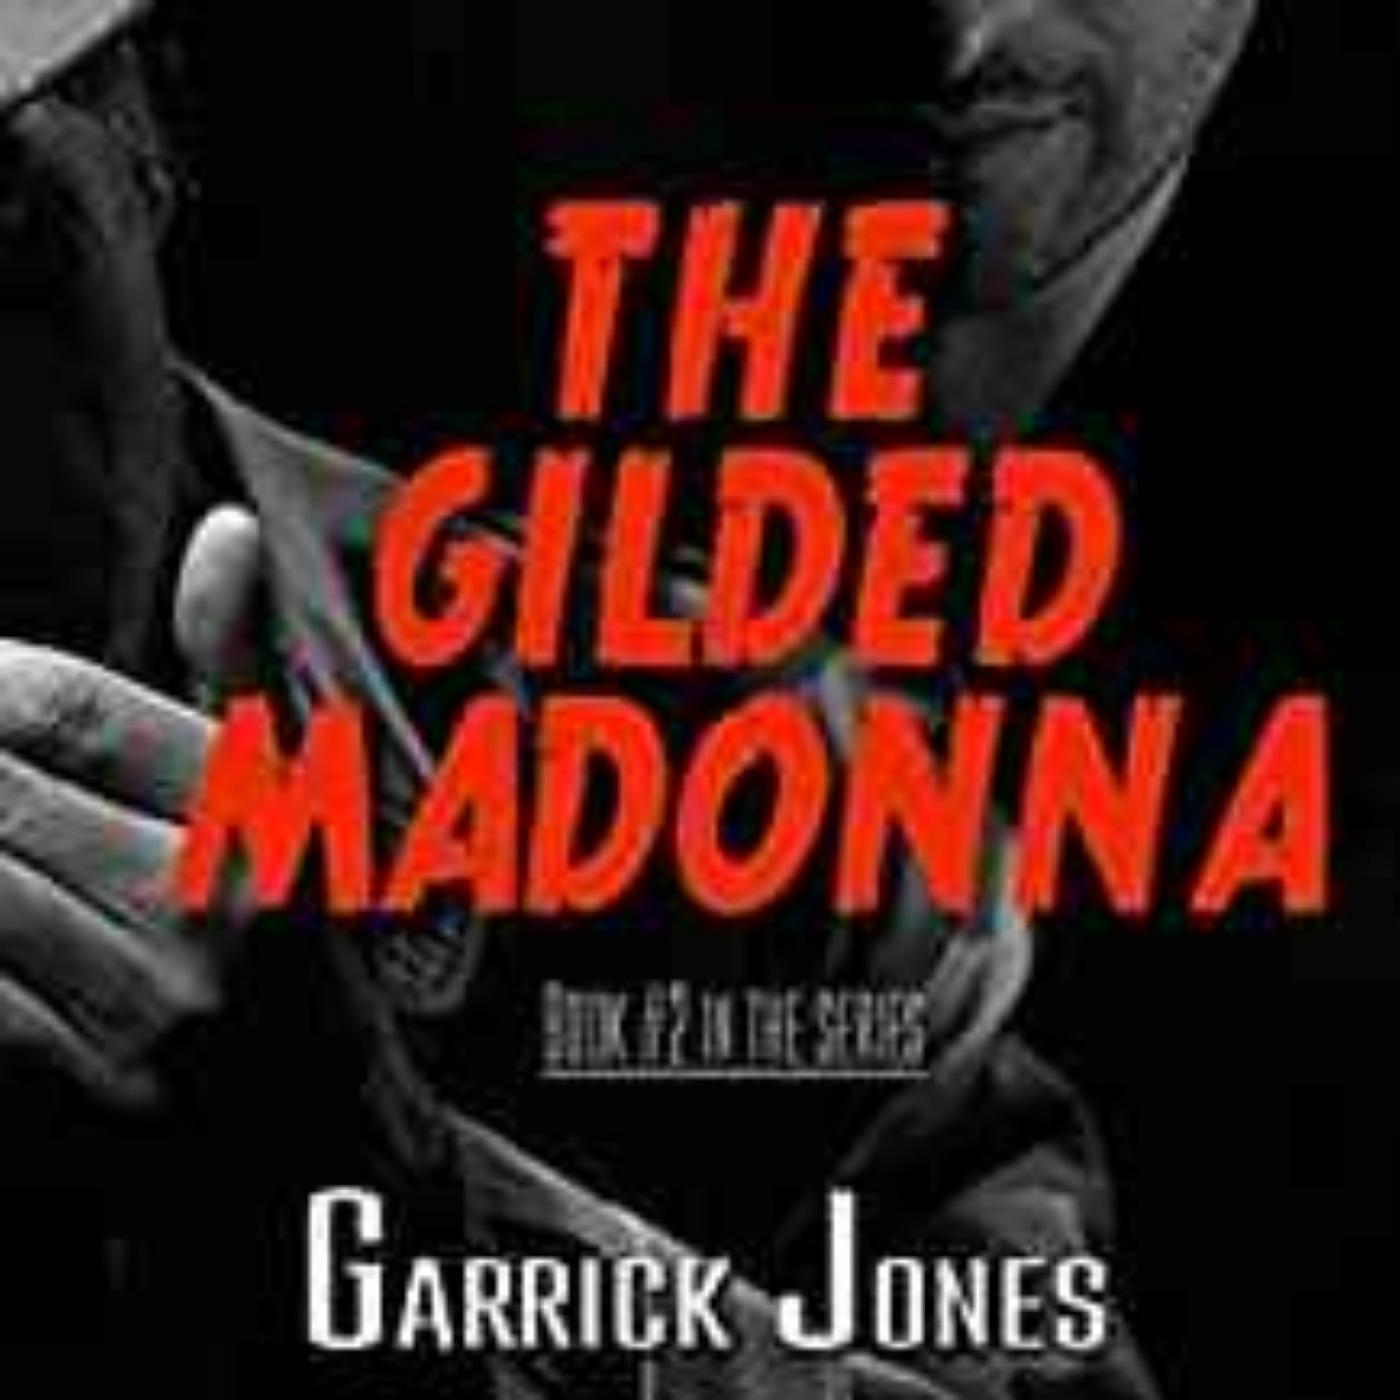 GARRICK JONES - THE GILDED MADONNA